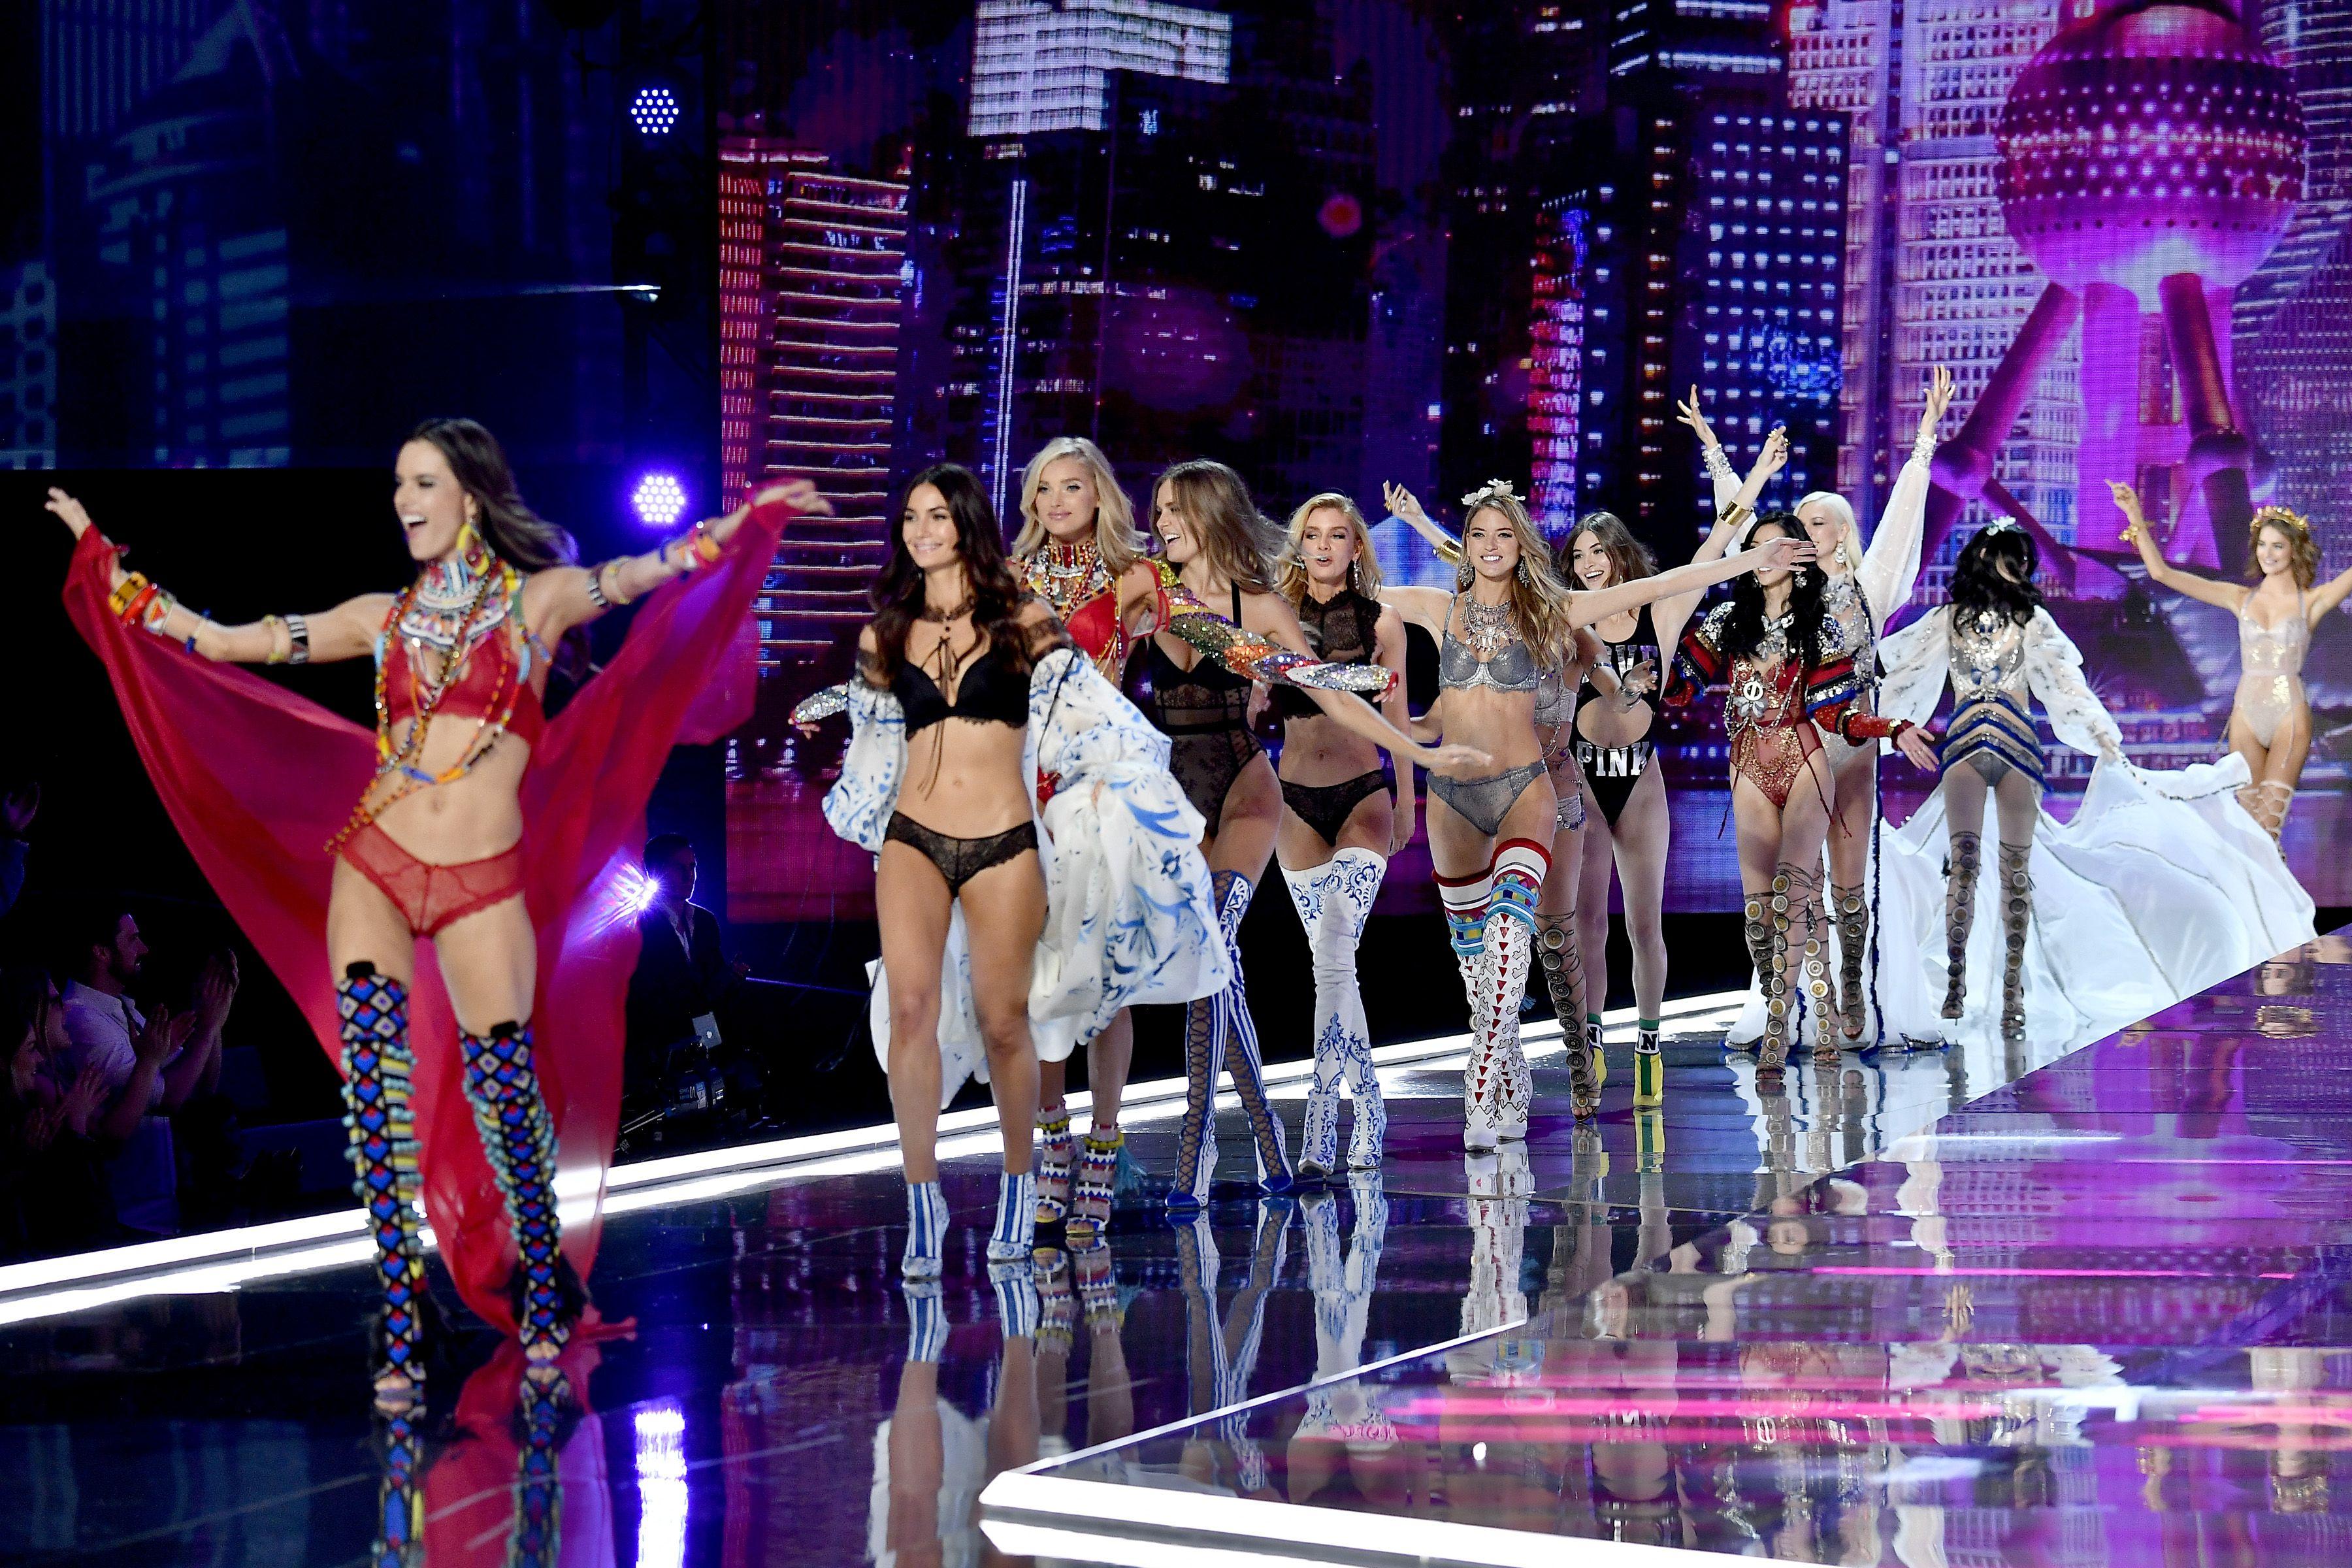 Victoria S Secret Fashion Show 2019 Is Cancelled